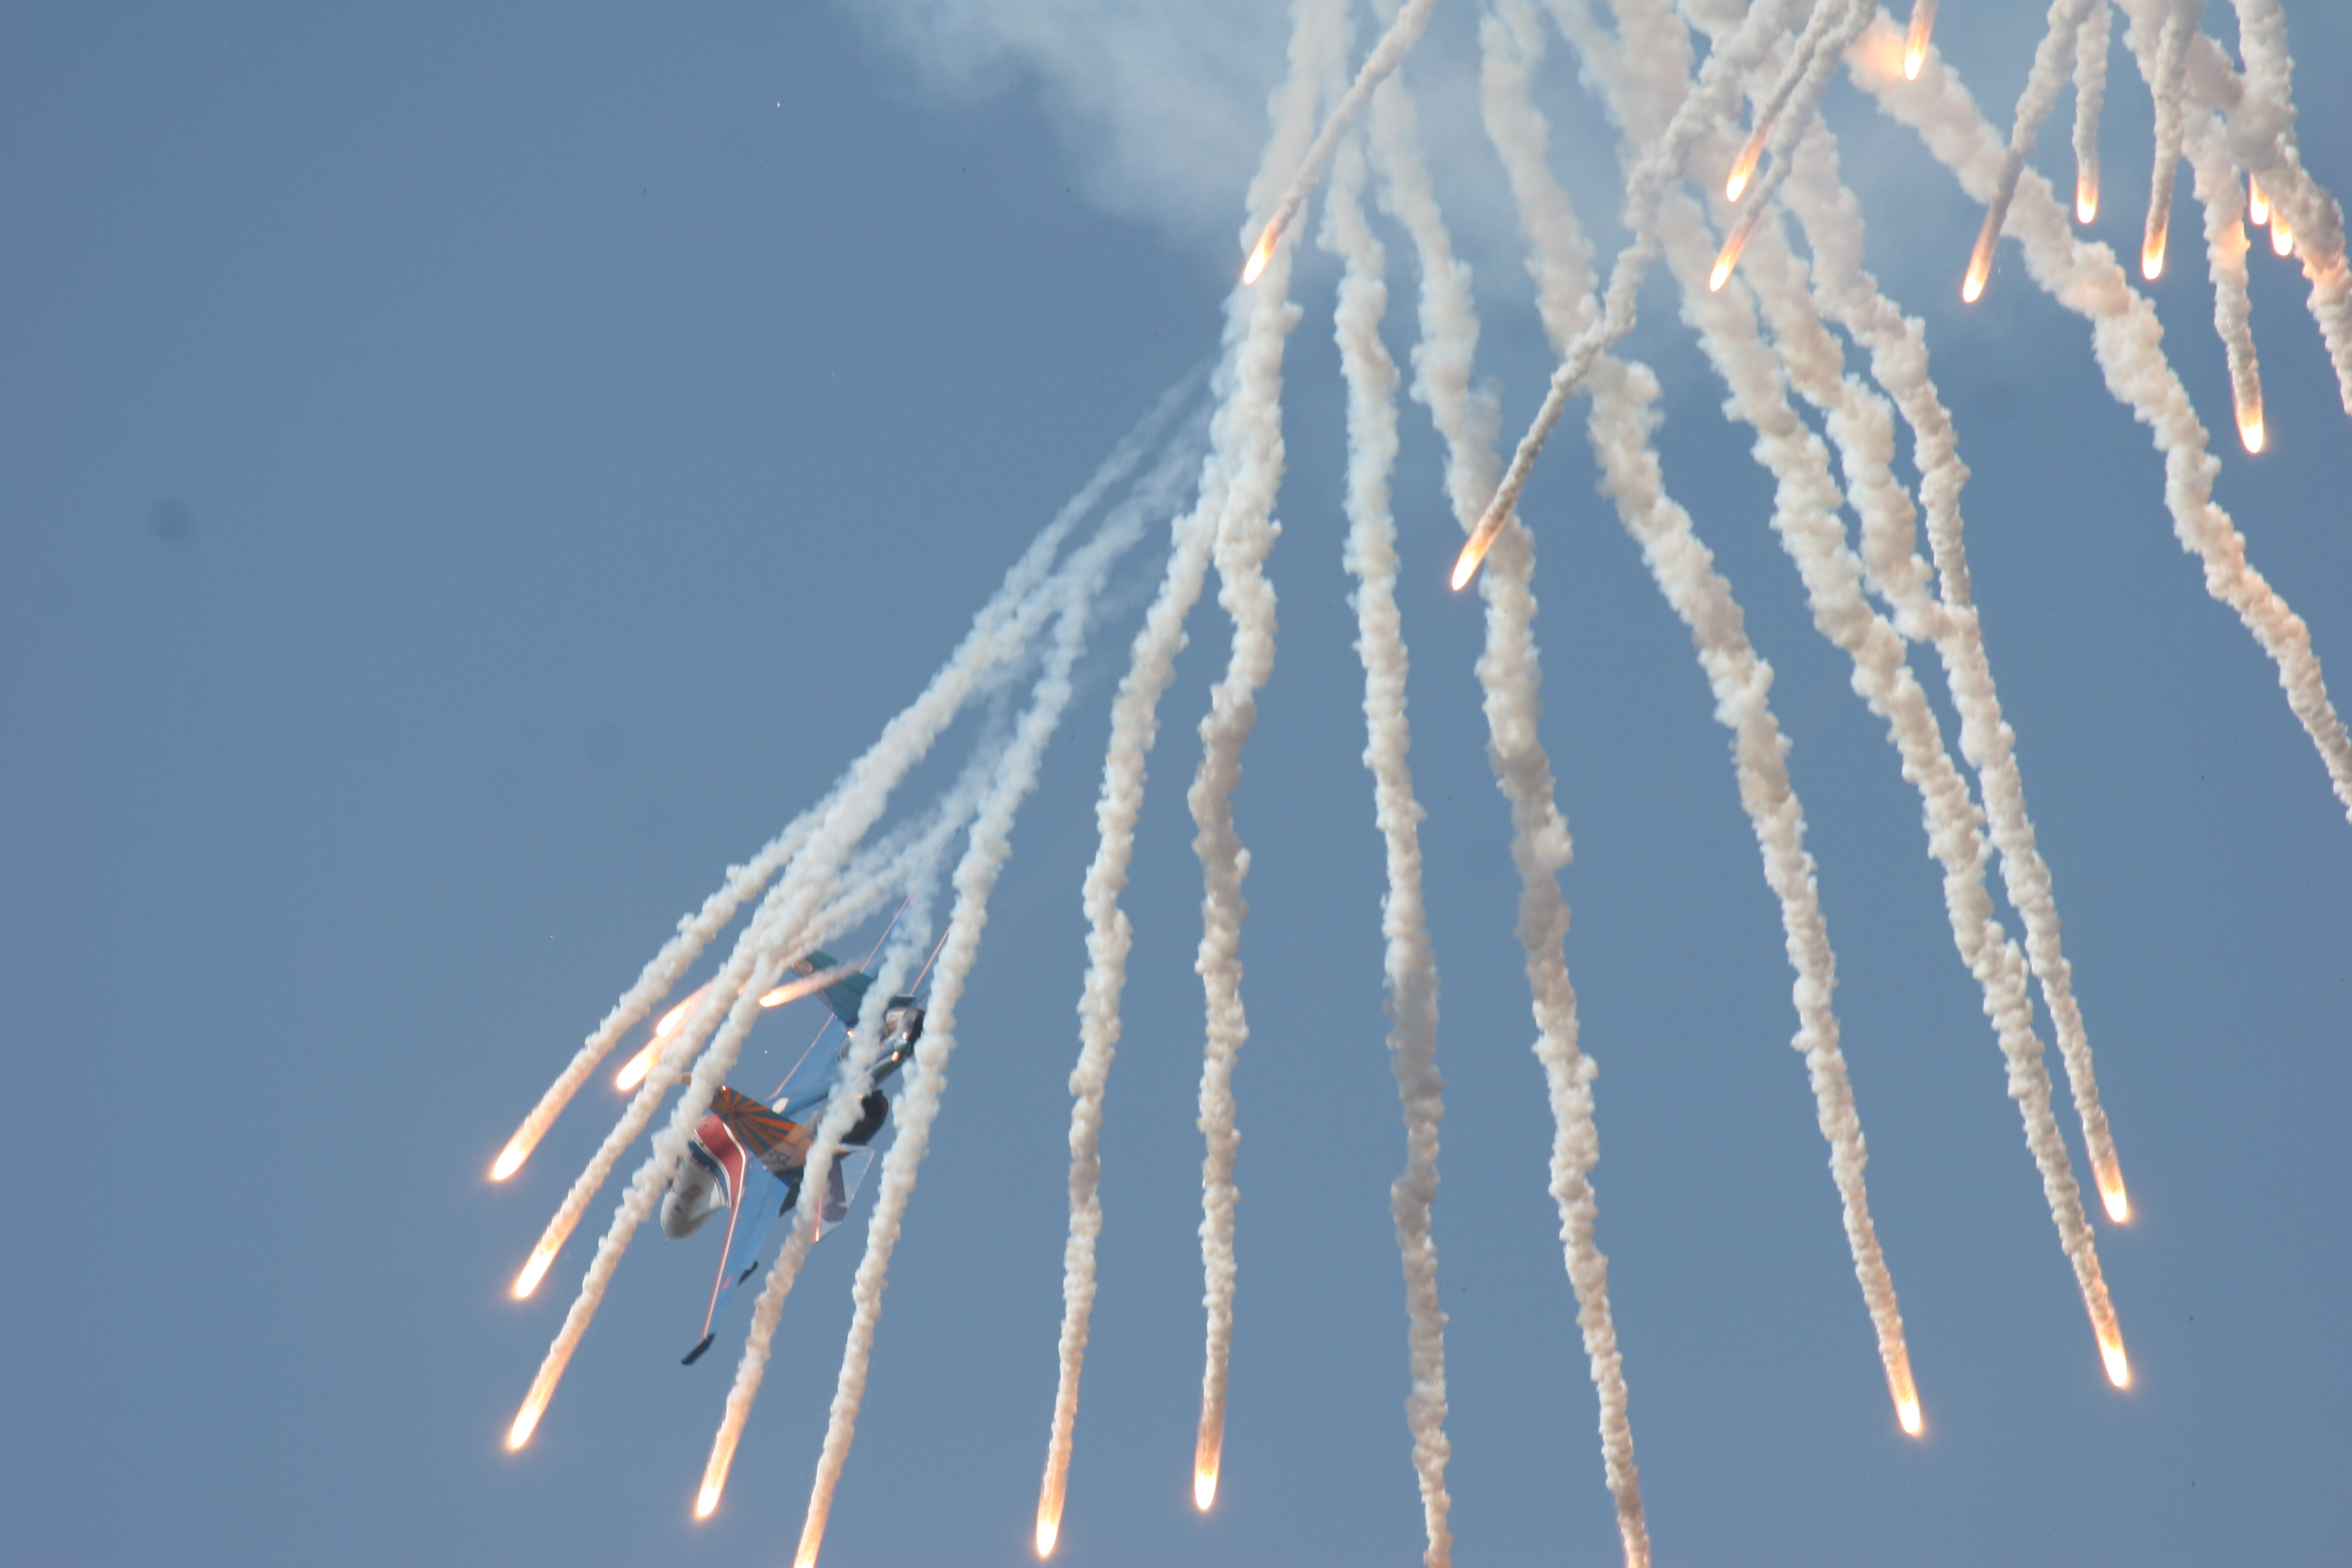 Su-27_Flanker_shoots_off_false_heat_targ